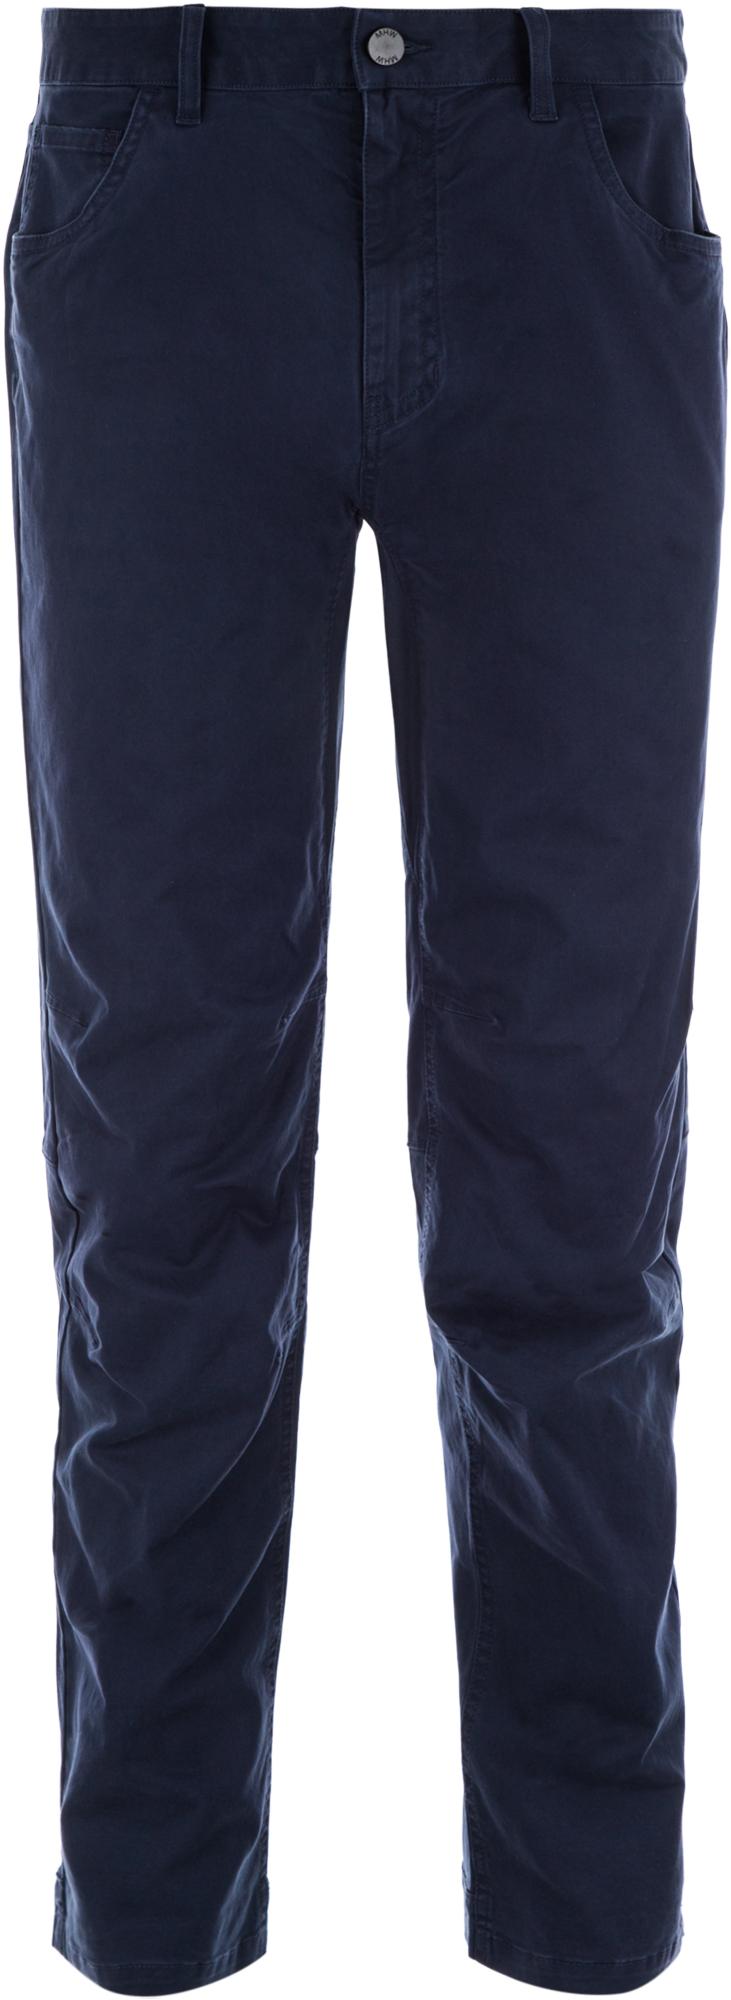 Mountain Hardwear Брюки мужские Mountain Hardwear Cederberg, размер 54